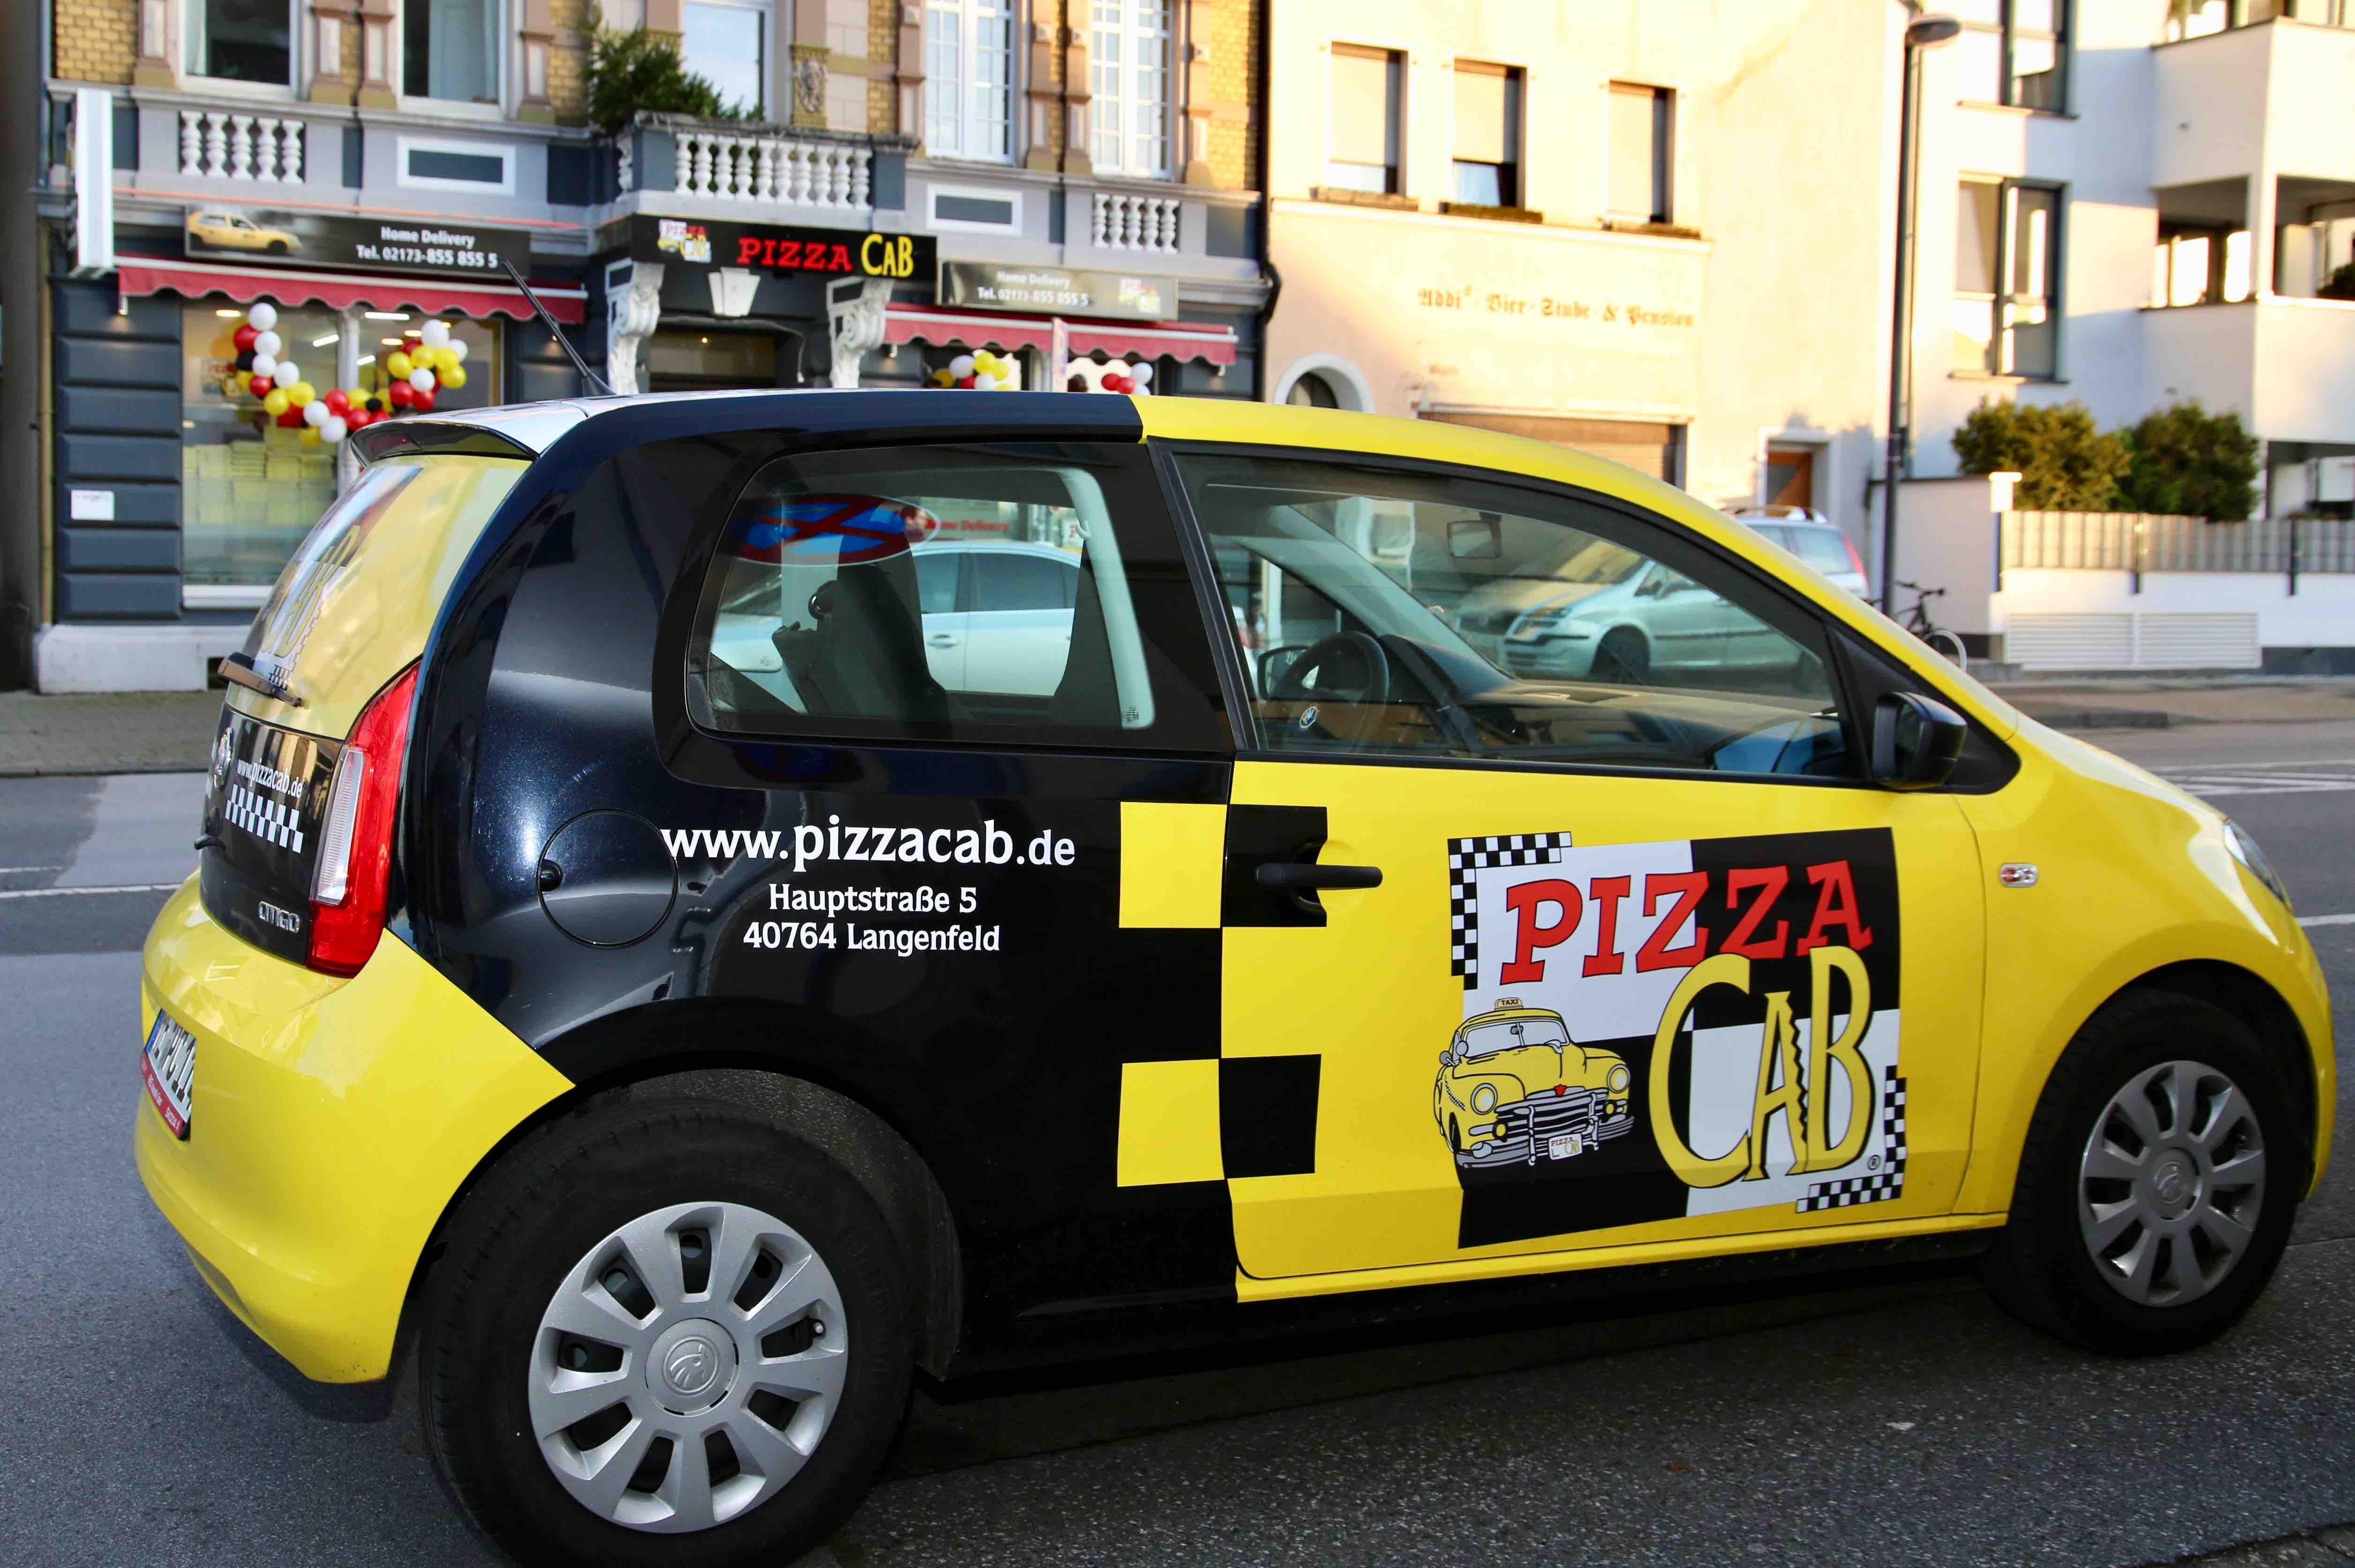 Die Pizza Cab Langenfeld Liefertaxis